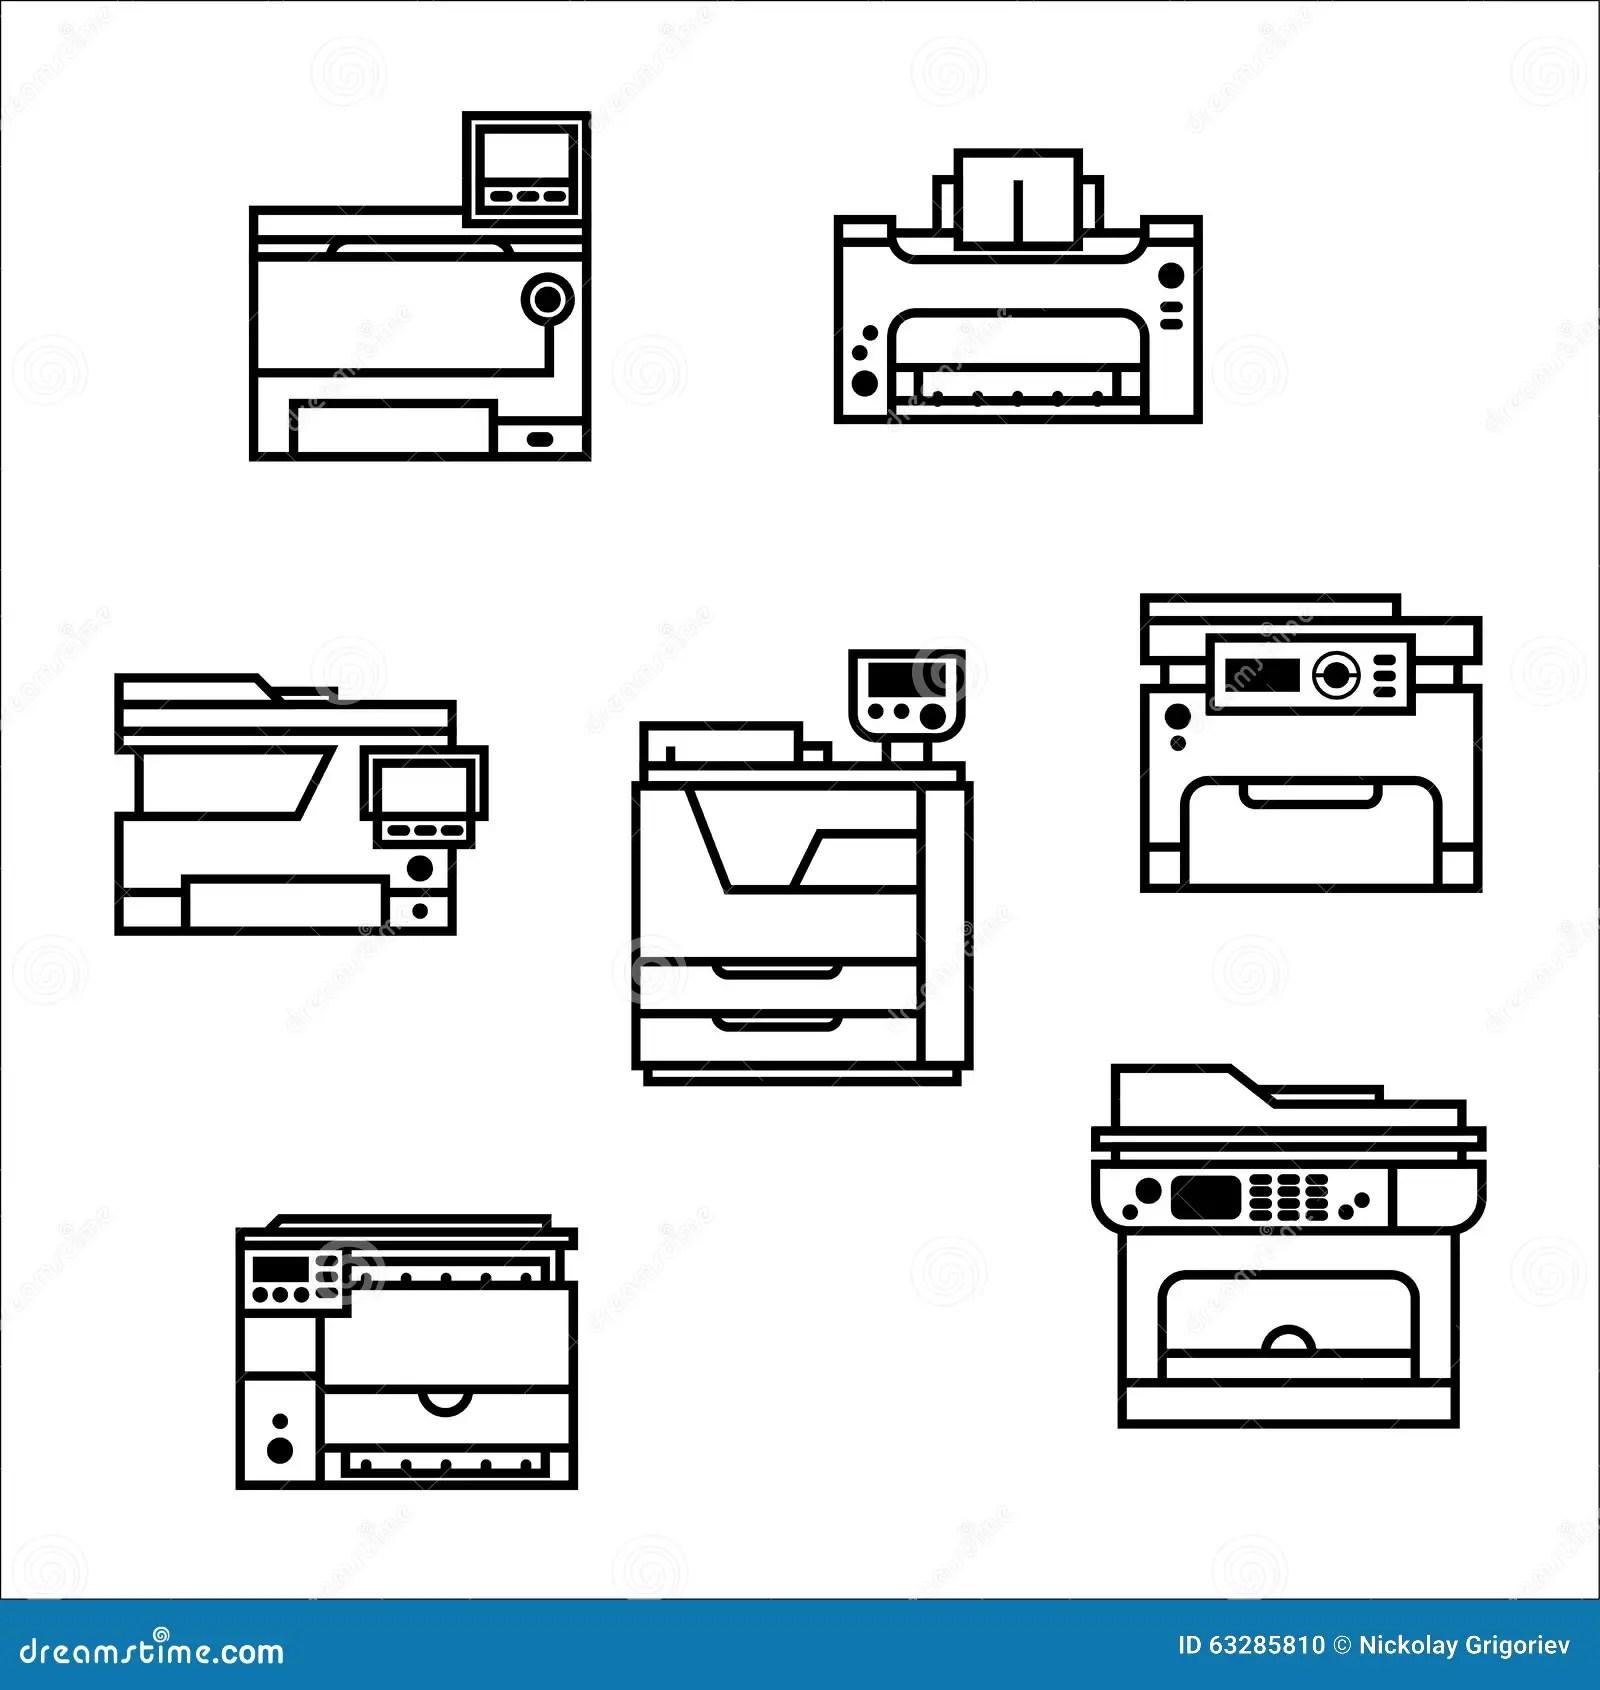 Wireless Fax Machine